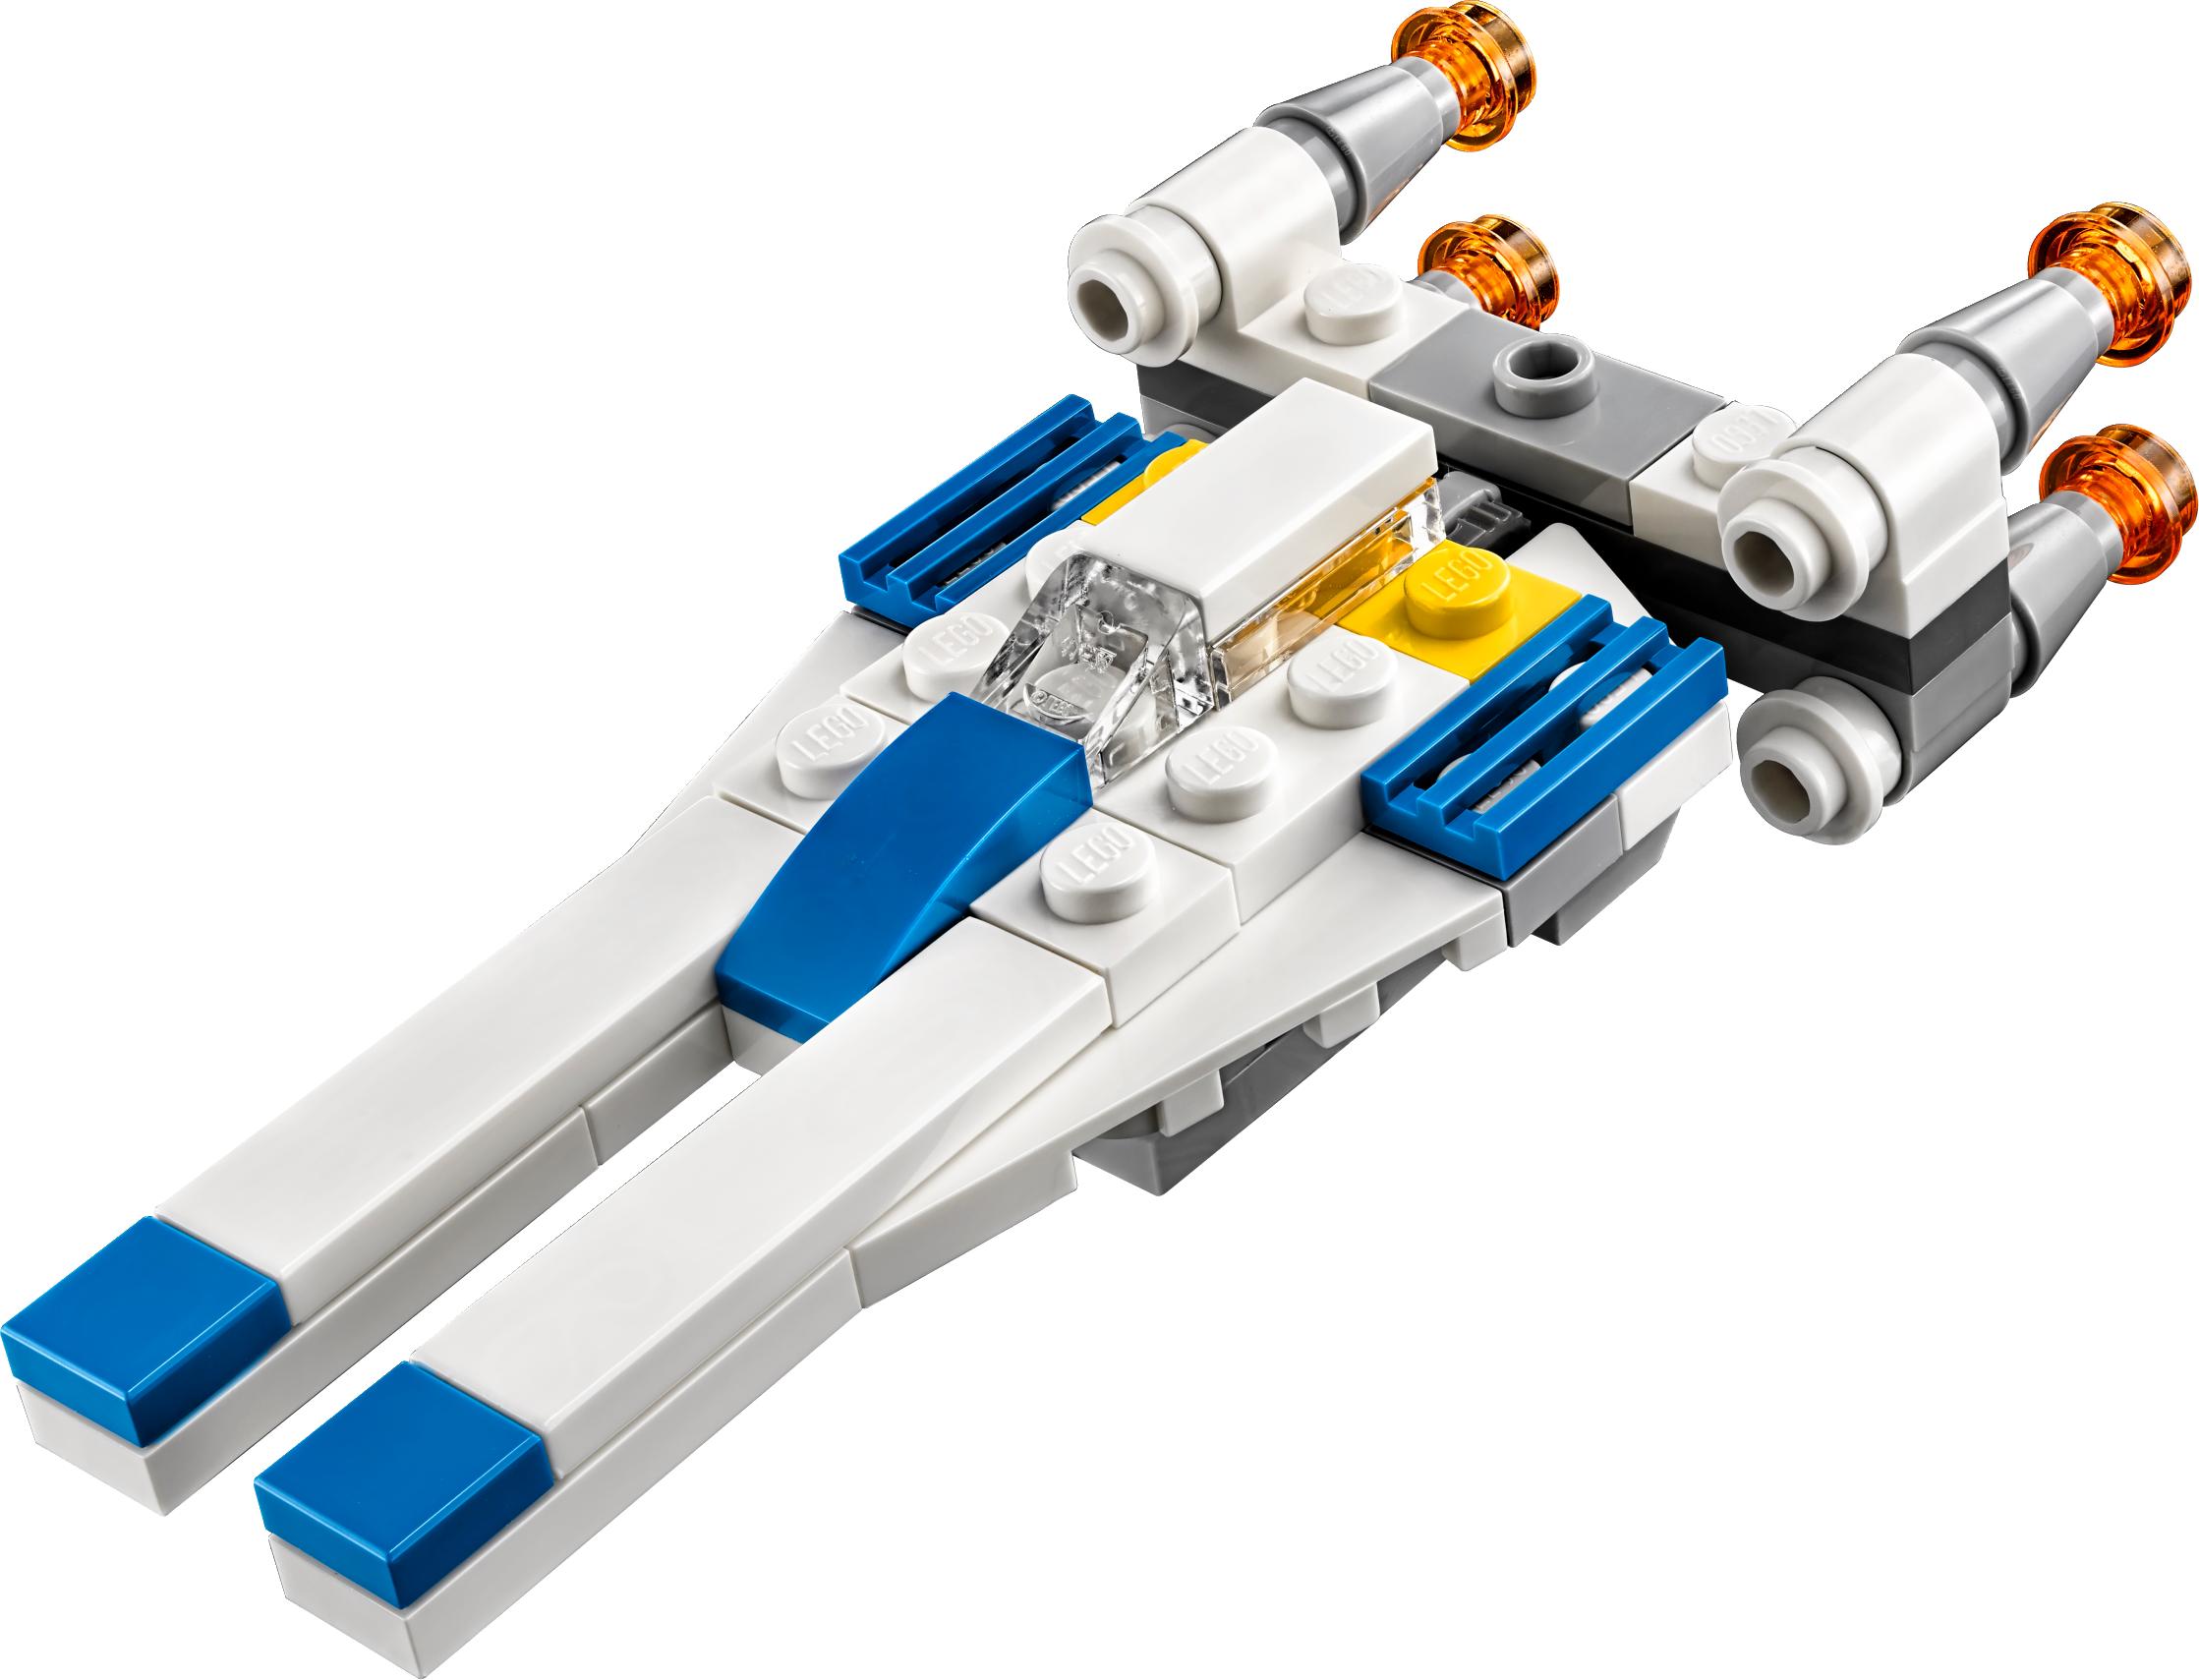 U-Wing Fighter